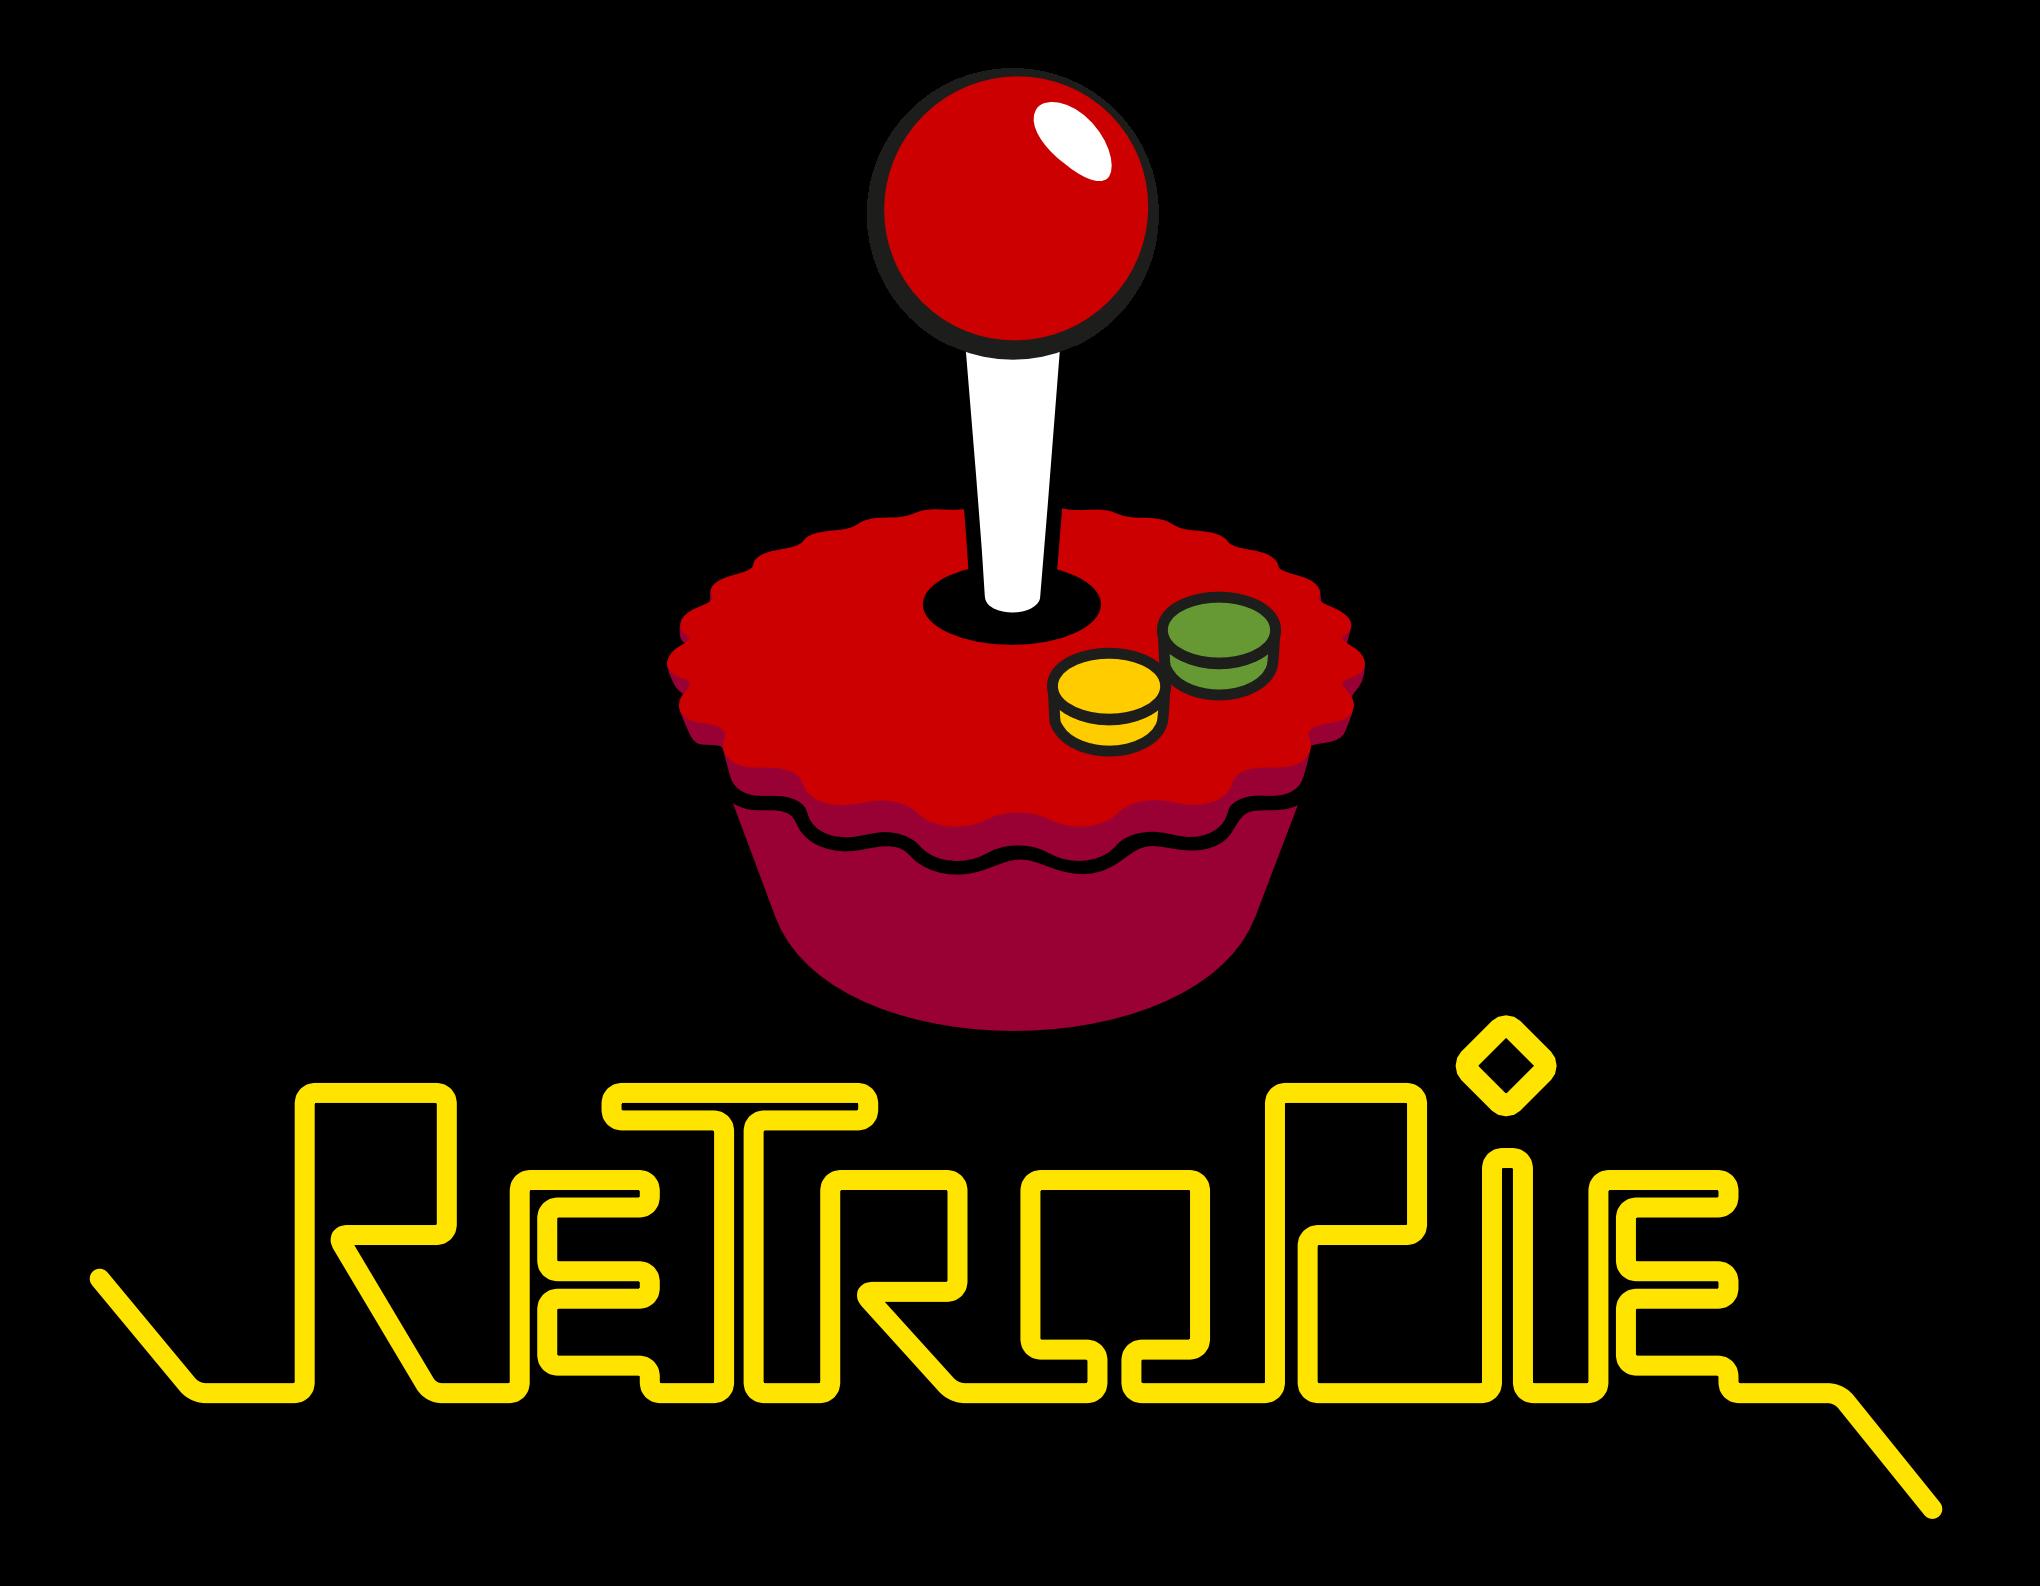 RetroPie Logo Download PNG